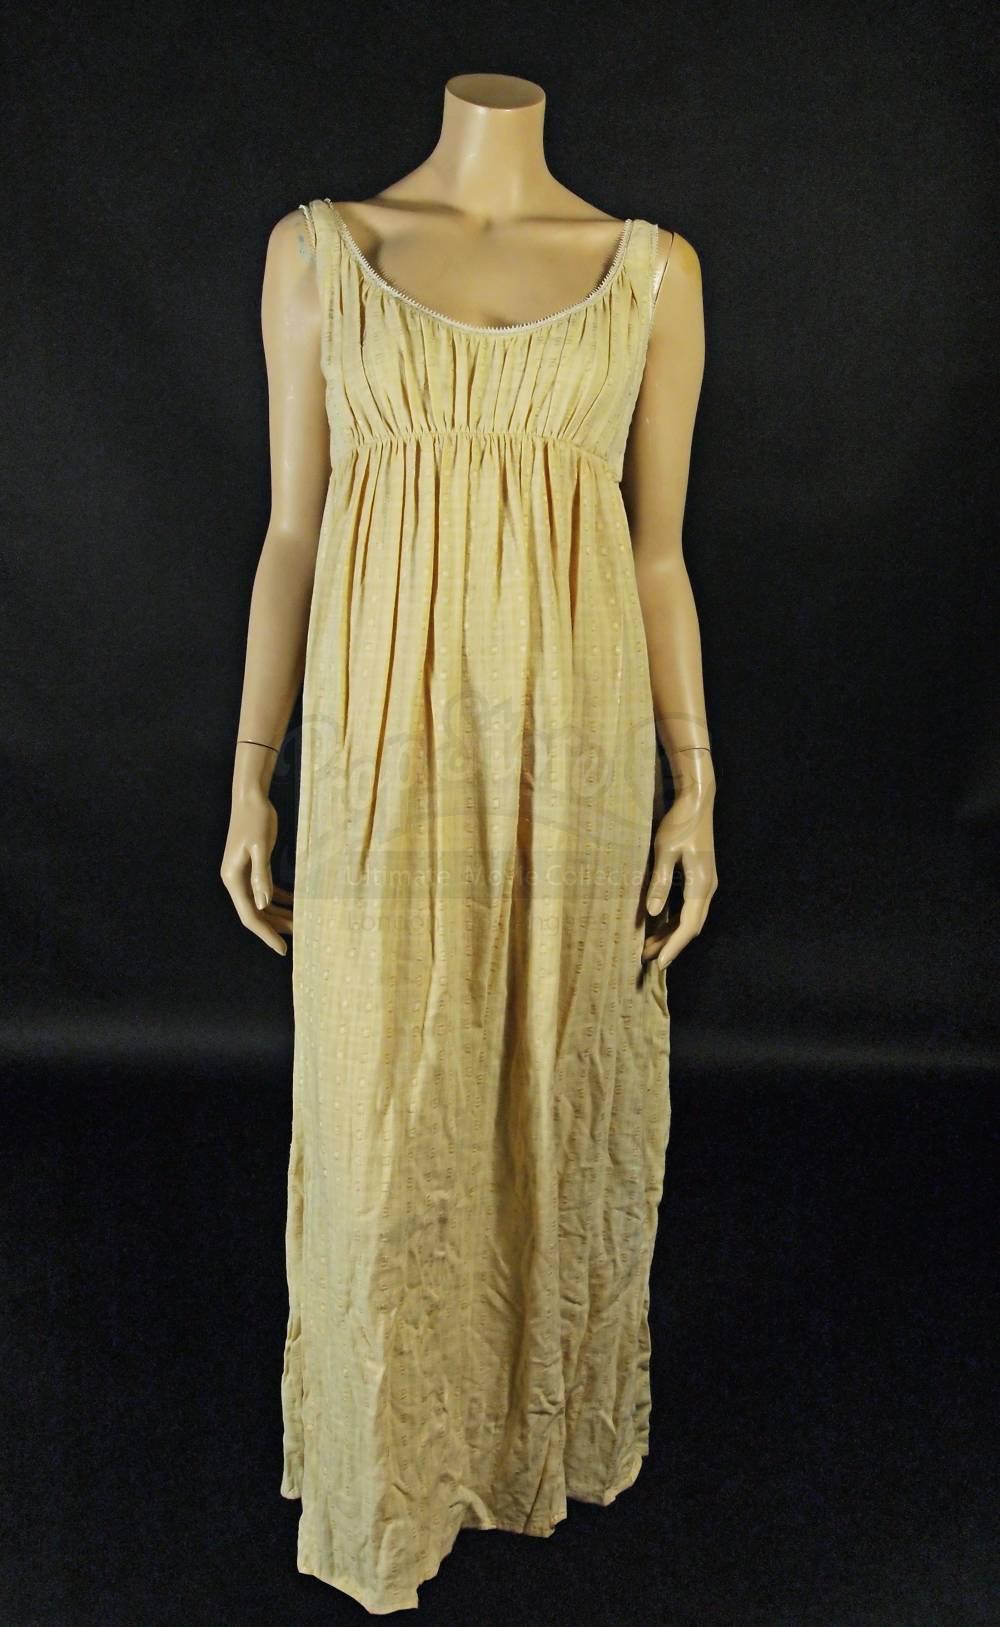 """King Arthur Costume: Petticoat"